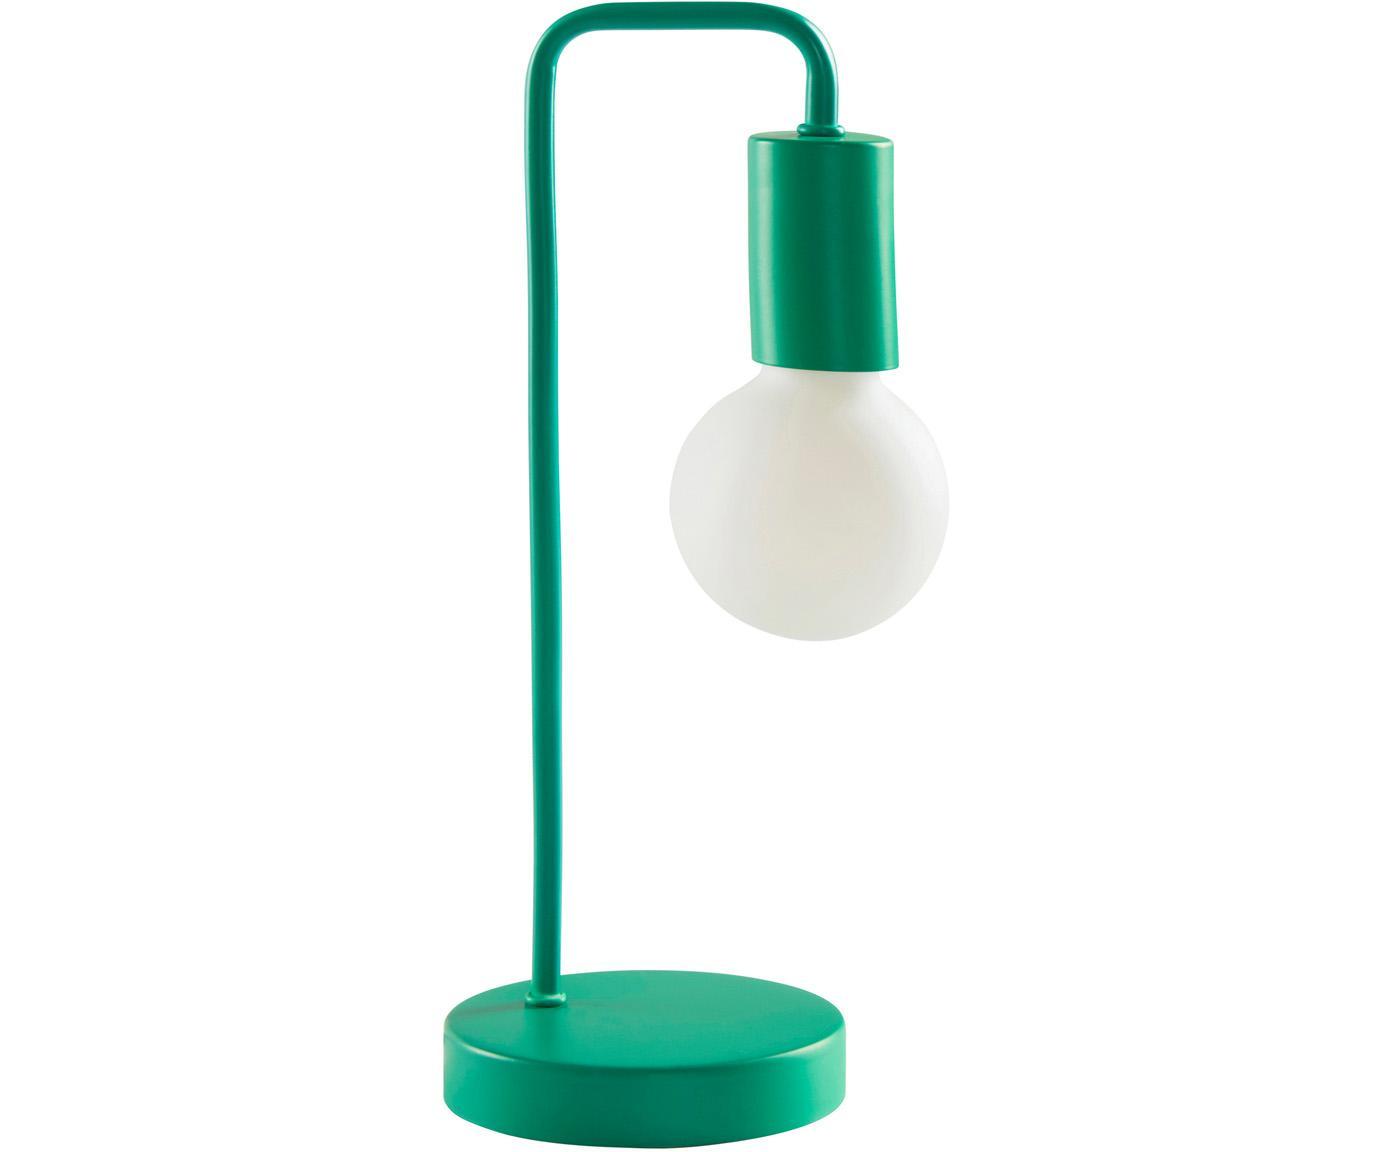 Tafellamp Cascais, Lampenkap: gecoat metaal, Groen, Ø 14 cm